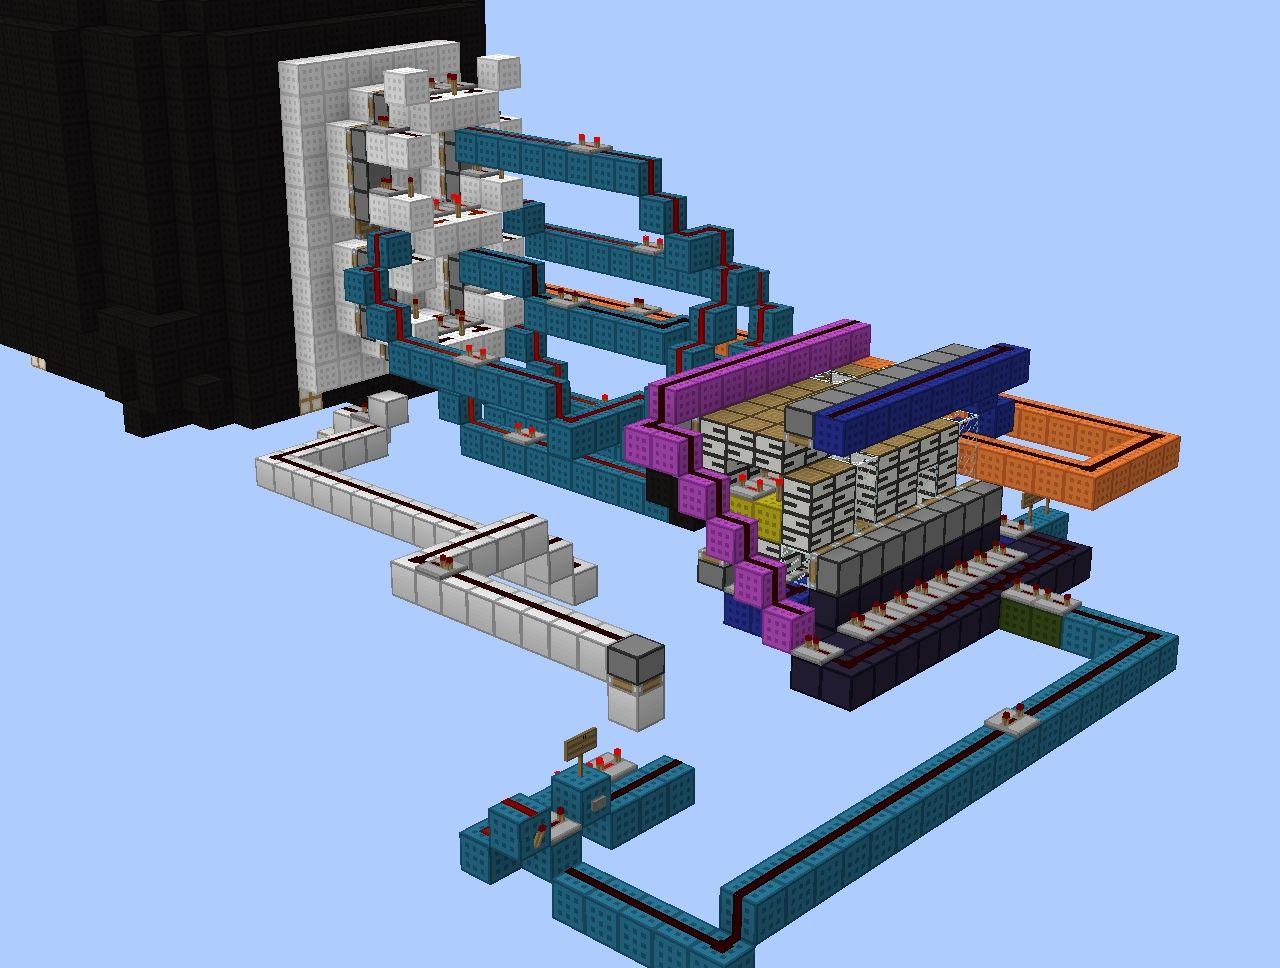 Minecraft Redstone Clock Display 8 Bit Freaksyrgys Project Wiring Mod